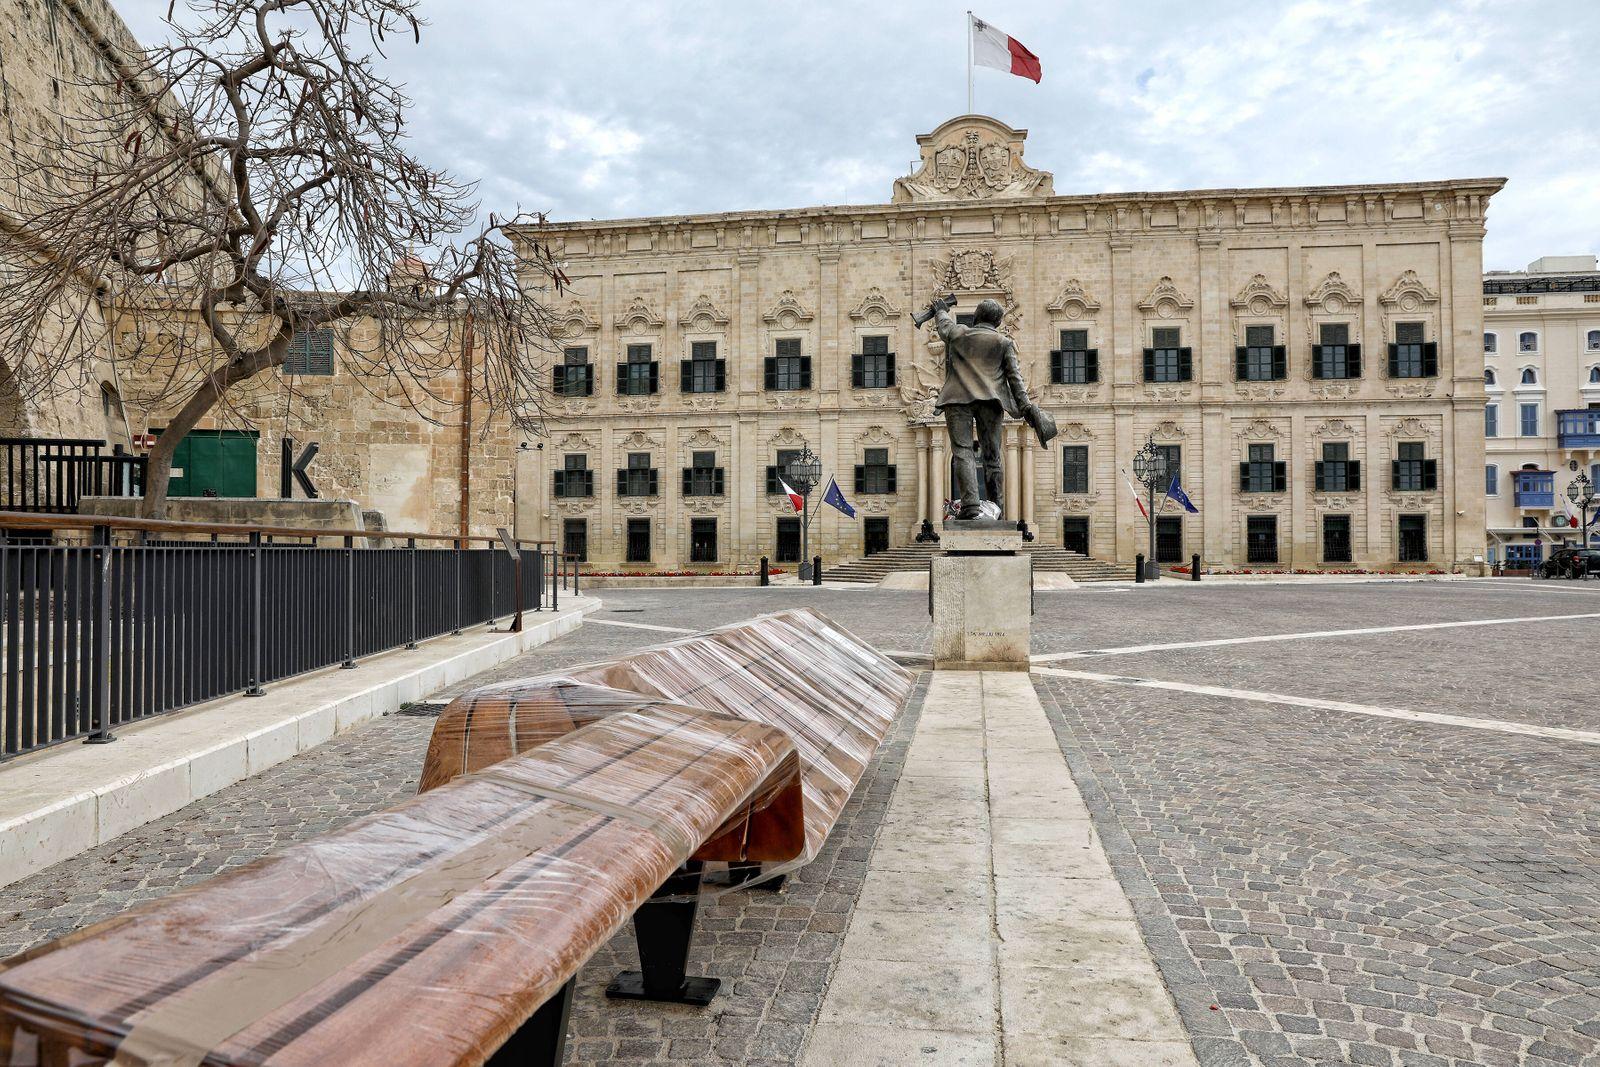 The Auberge de Castille in Castille Place, Valletta, Malta, houses the Office of the Prime Minister of Malta looks eeril